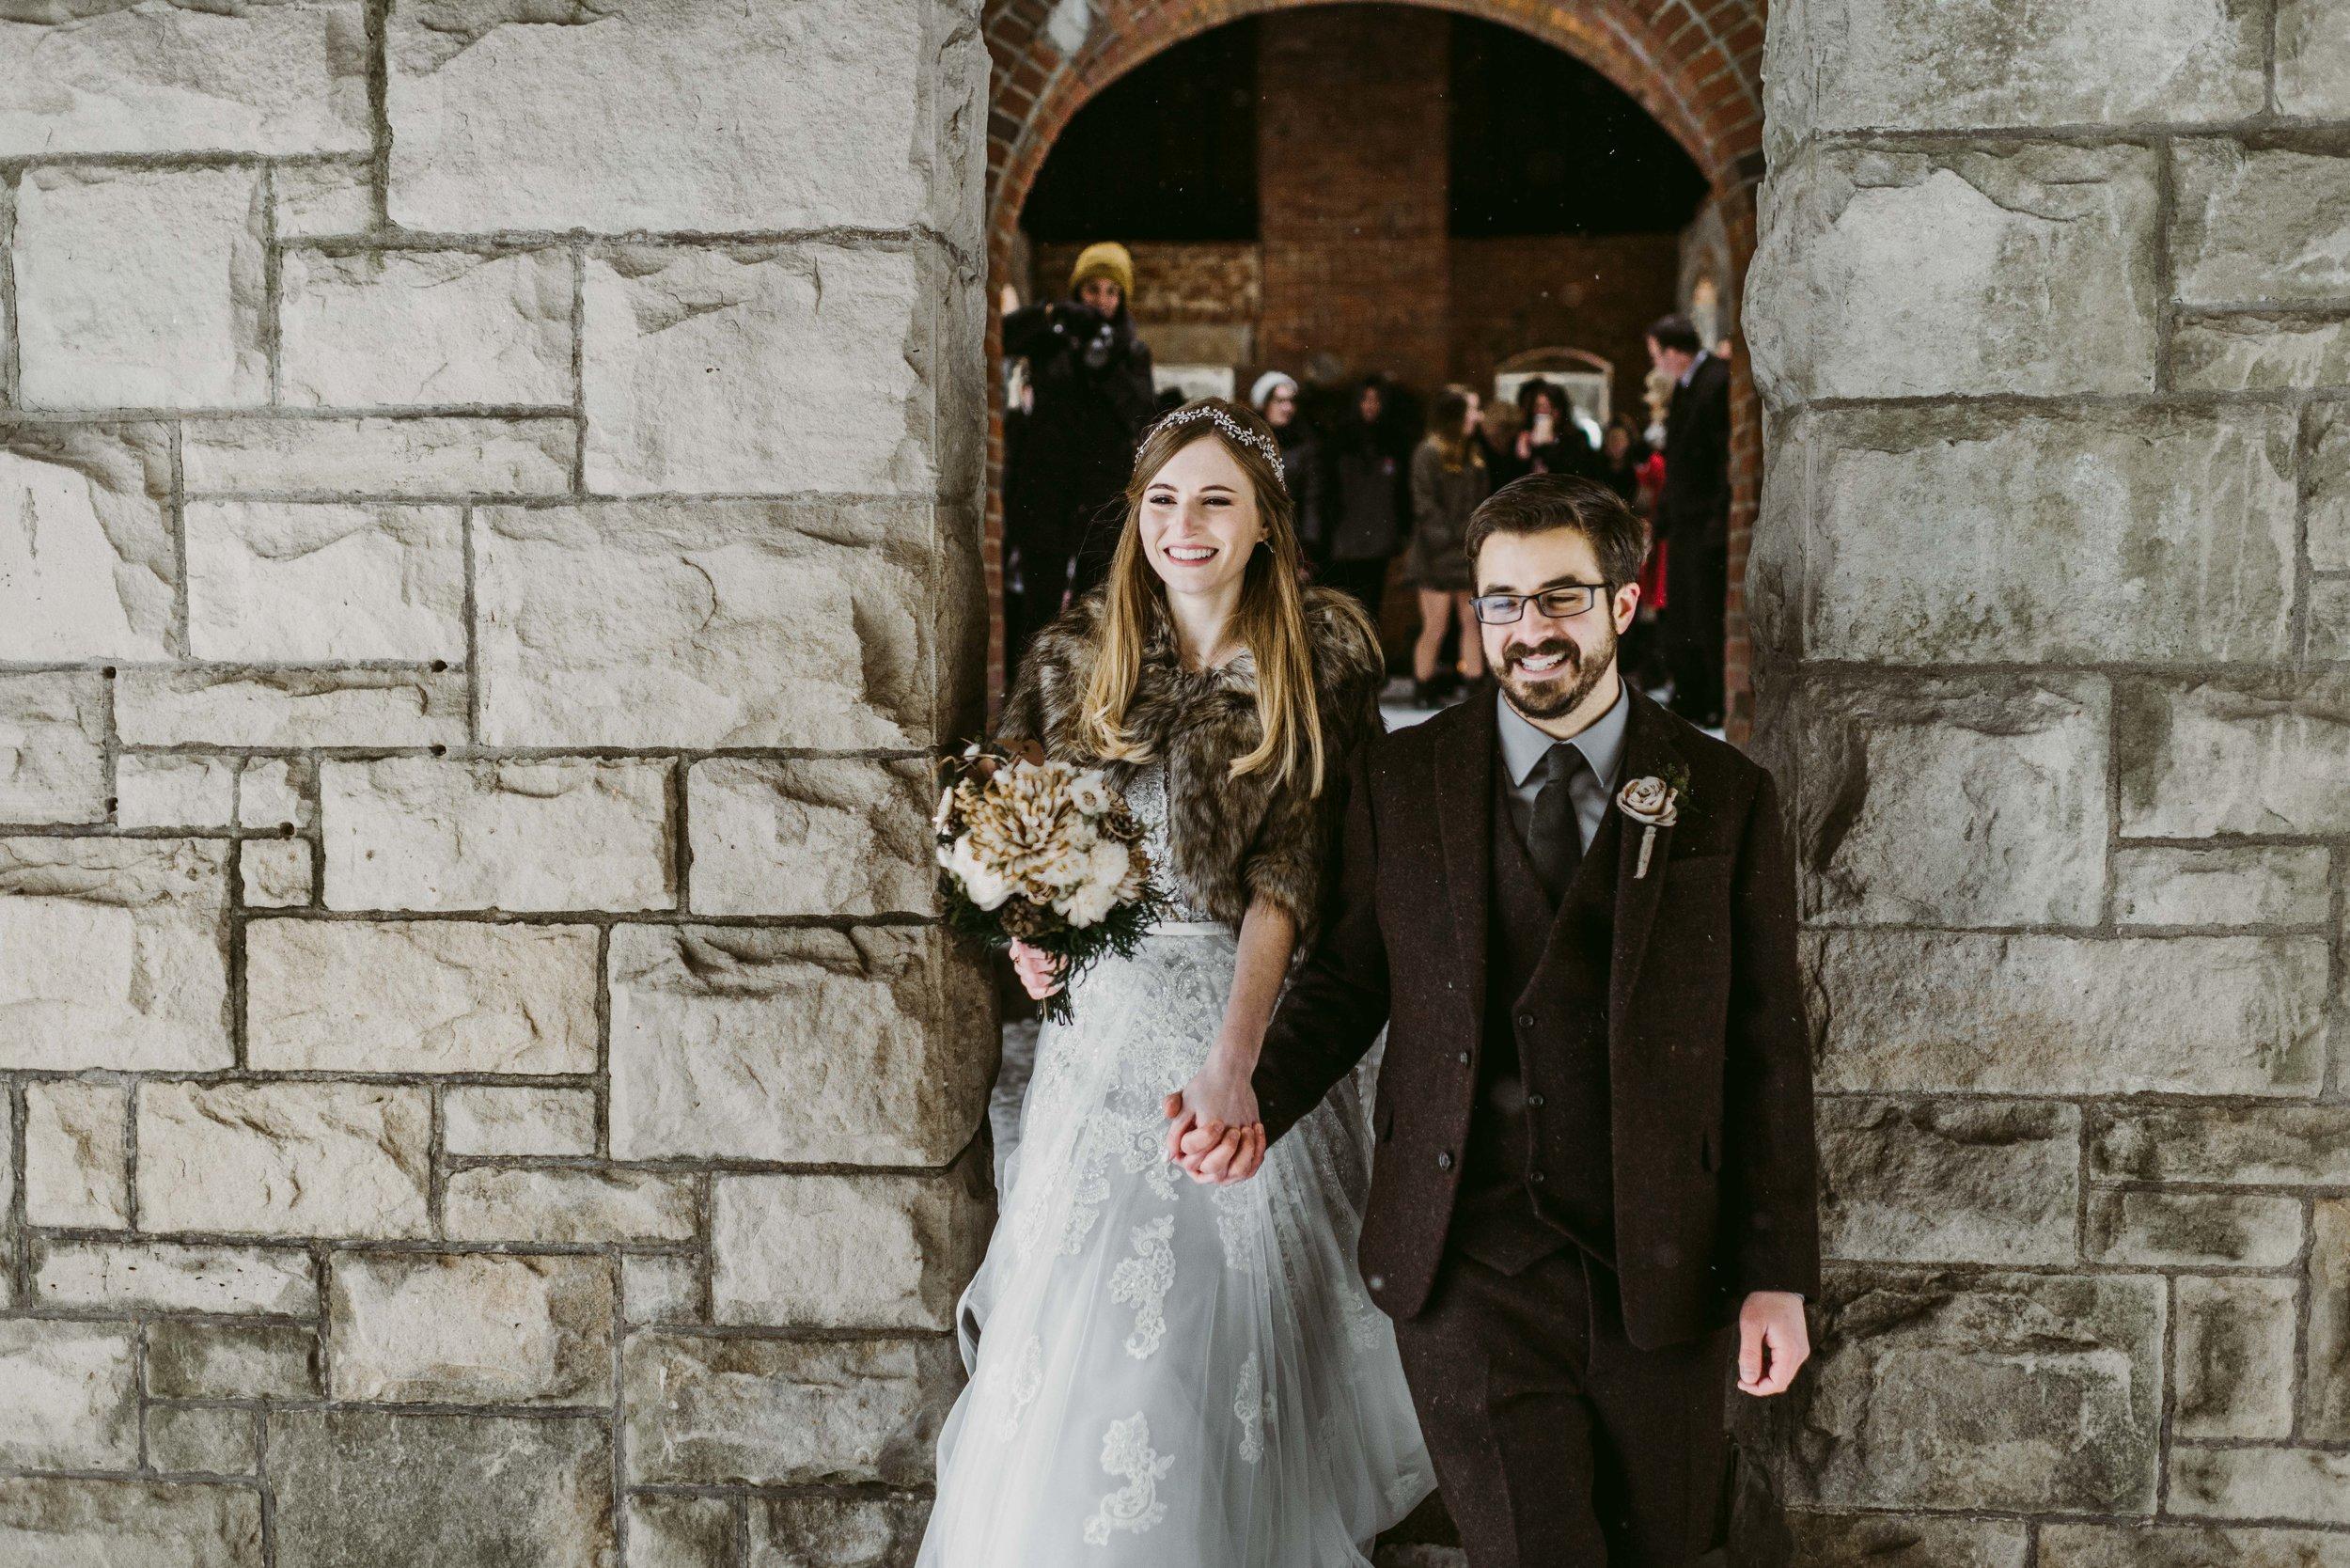 Winter-Squires-Castle-Wedding-James+Jessica_MJPHOTO2017-522.jpg